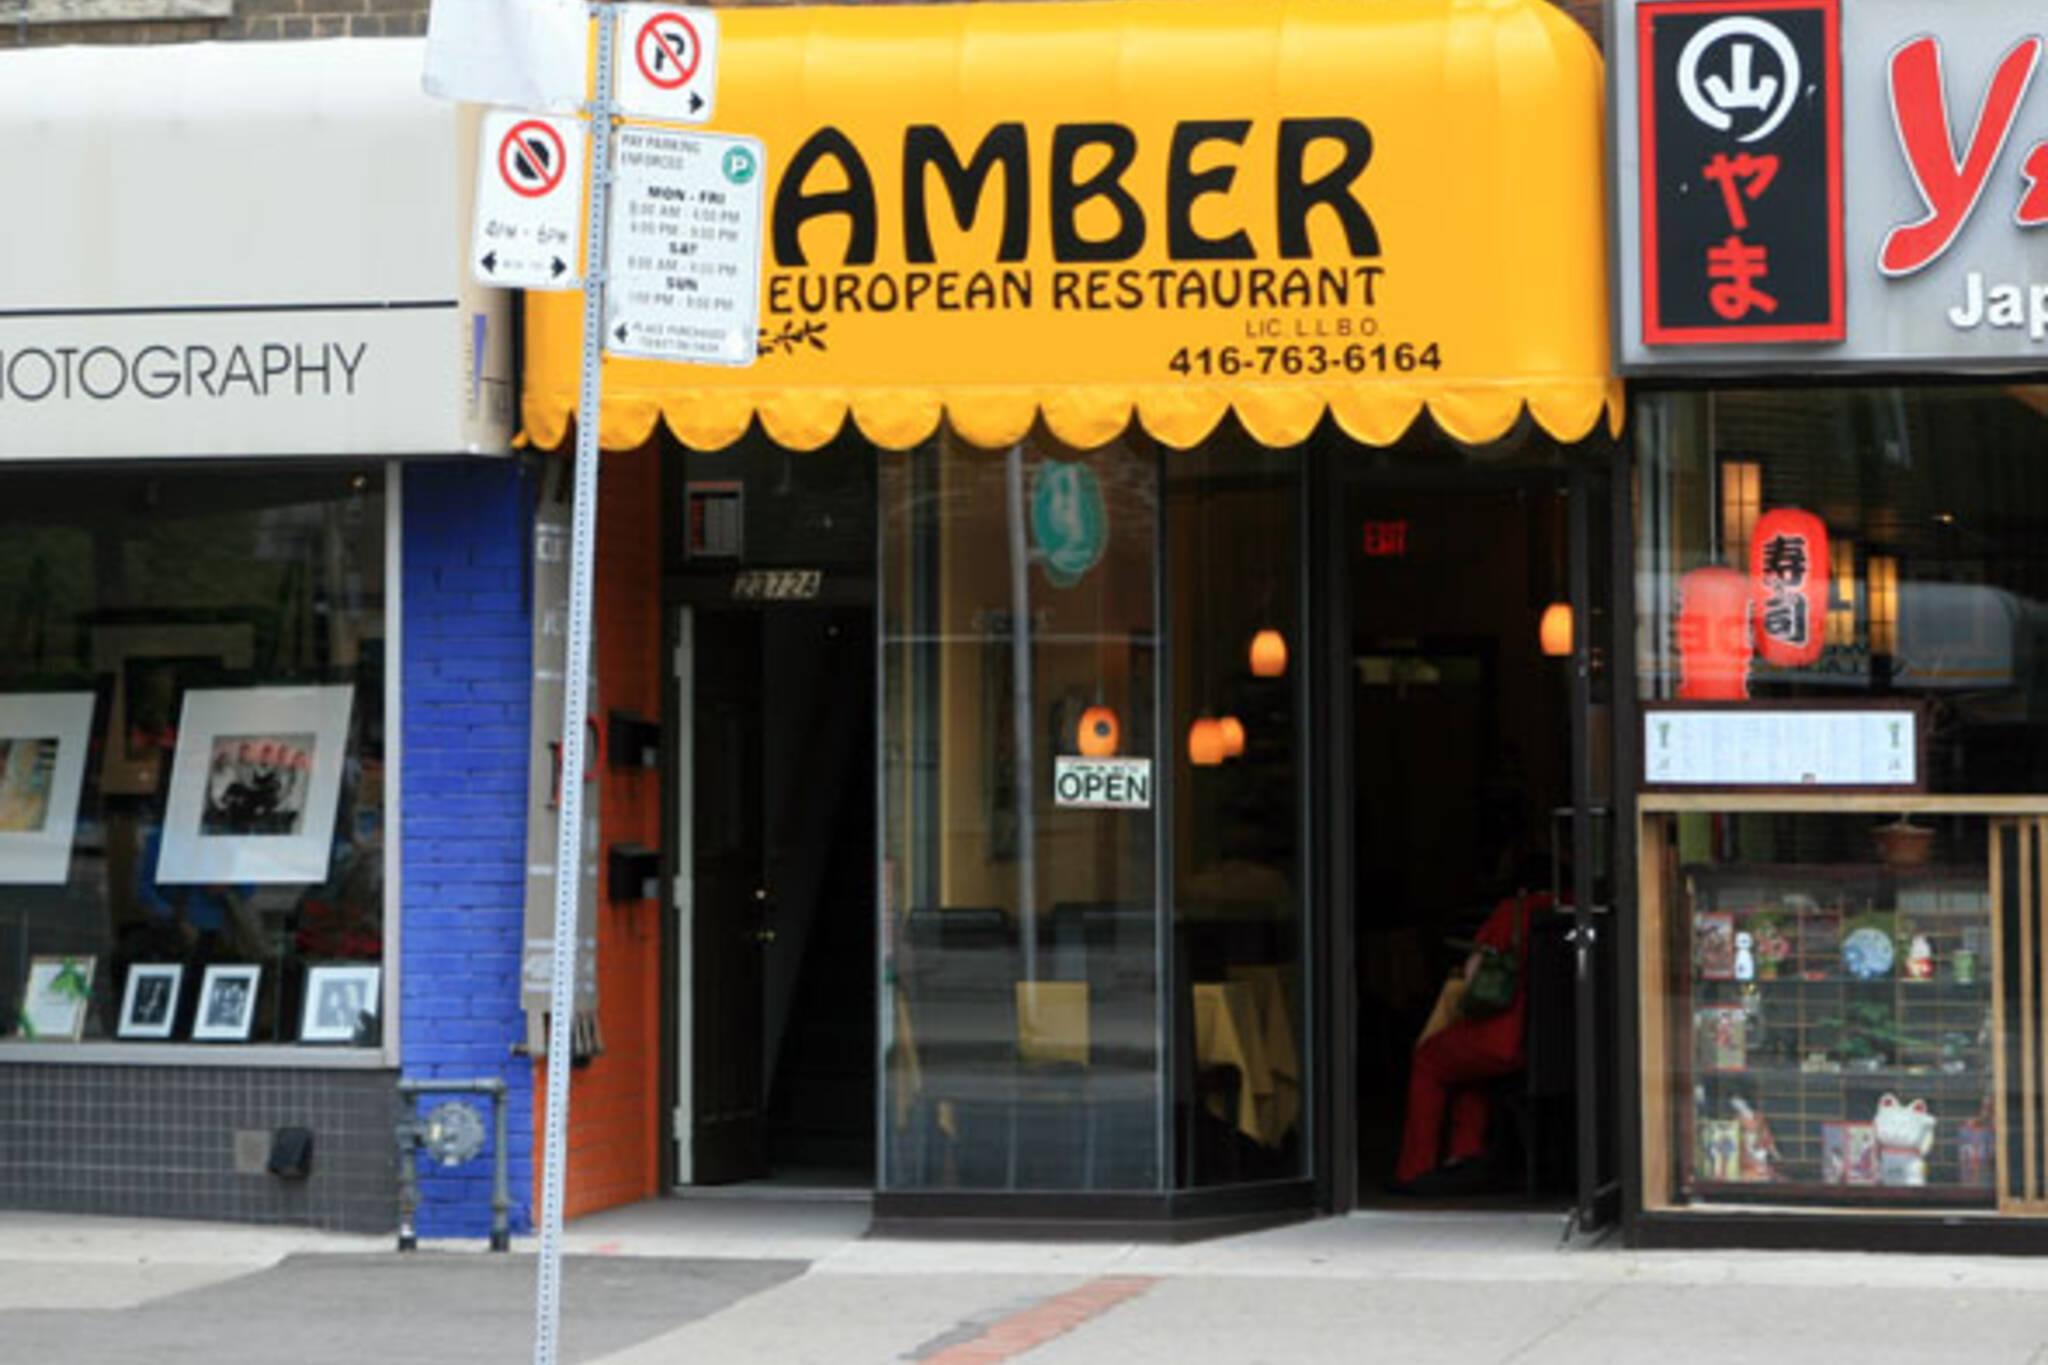 Amber European Restaurant Toronto